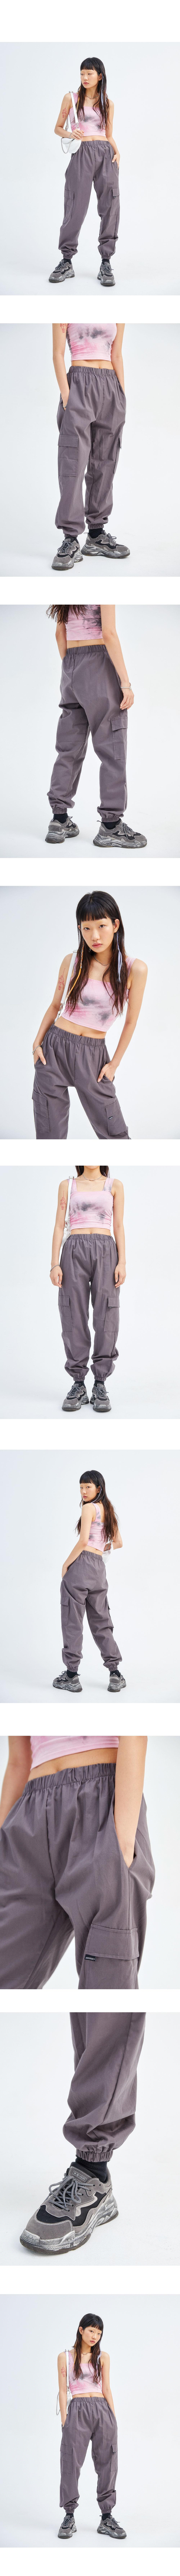 tidy jogger pants - woman